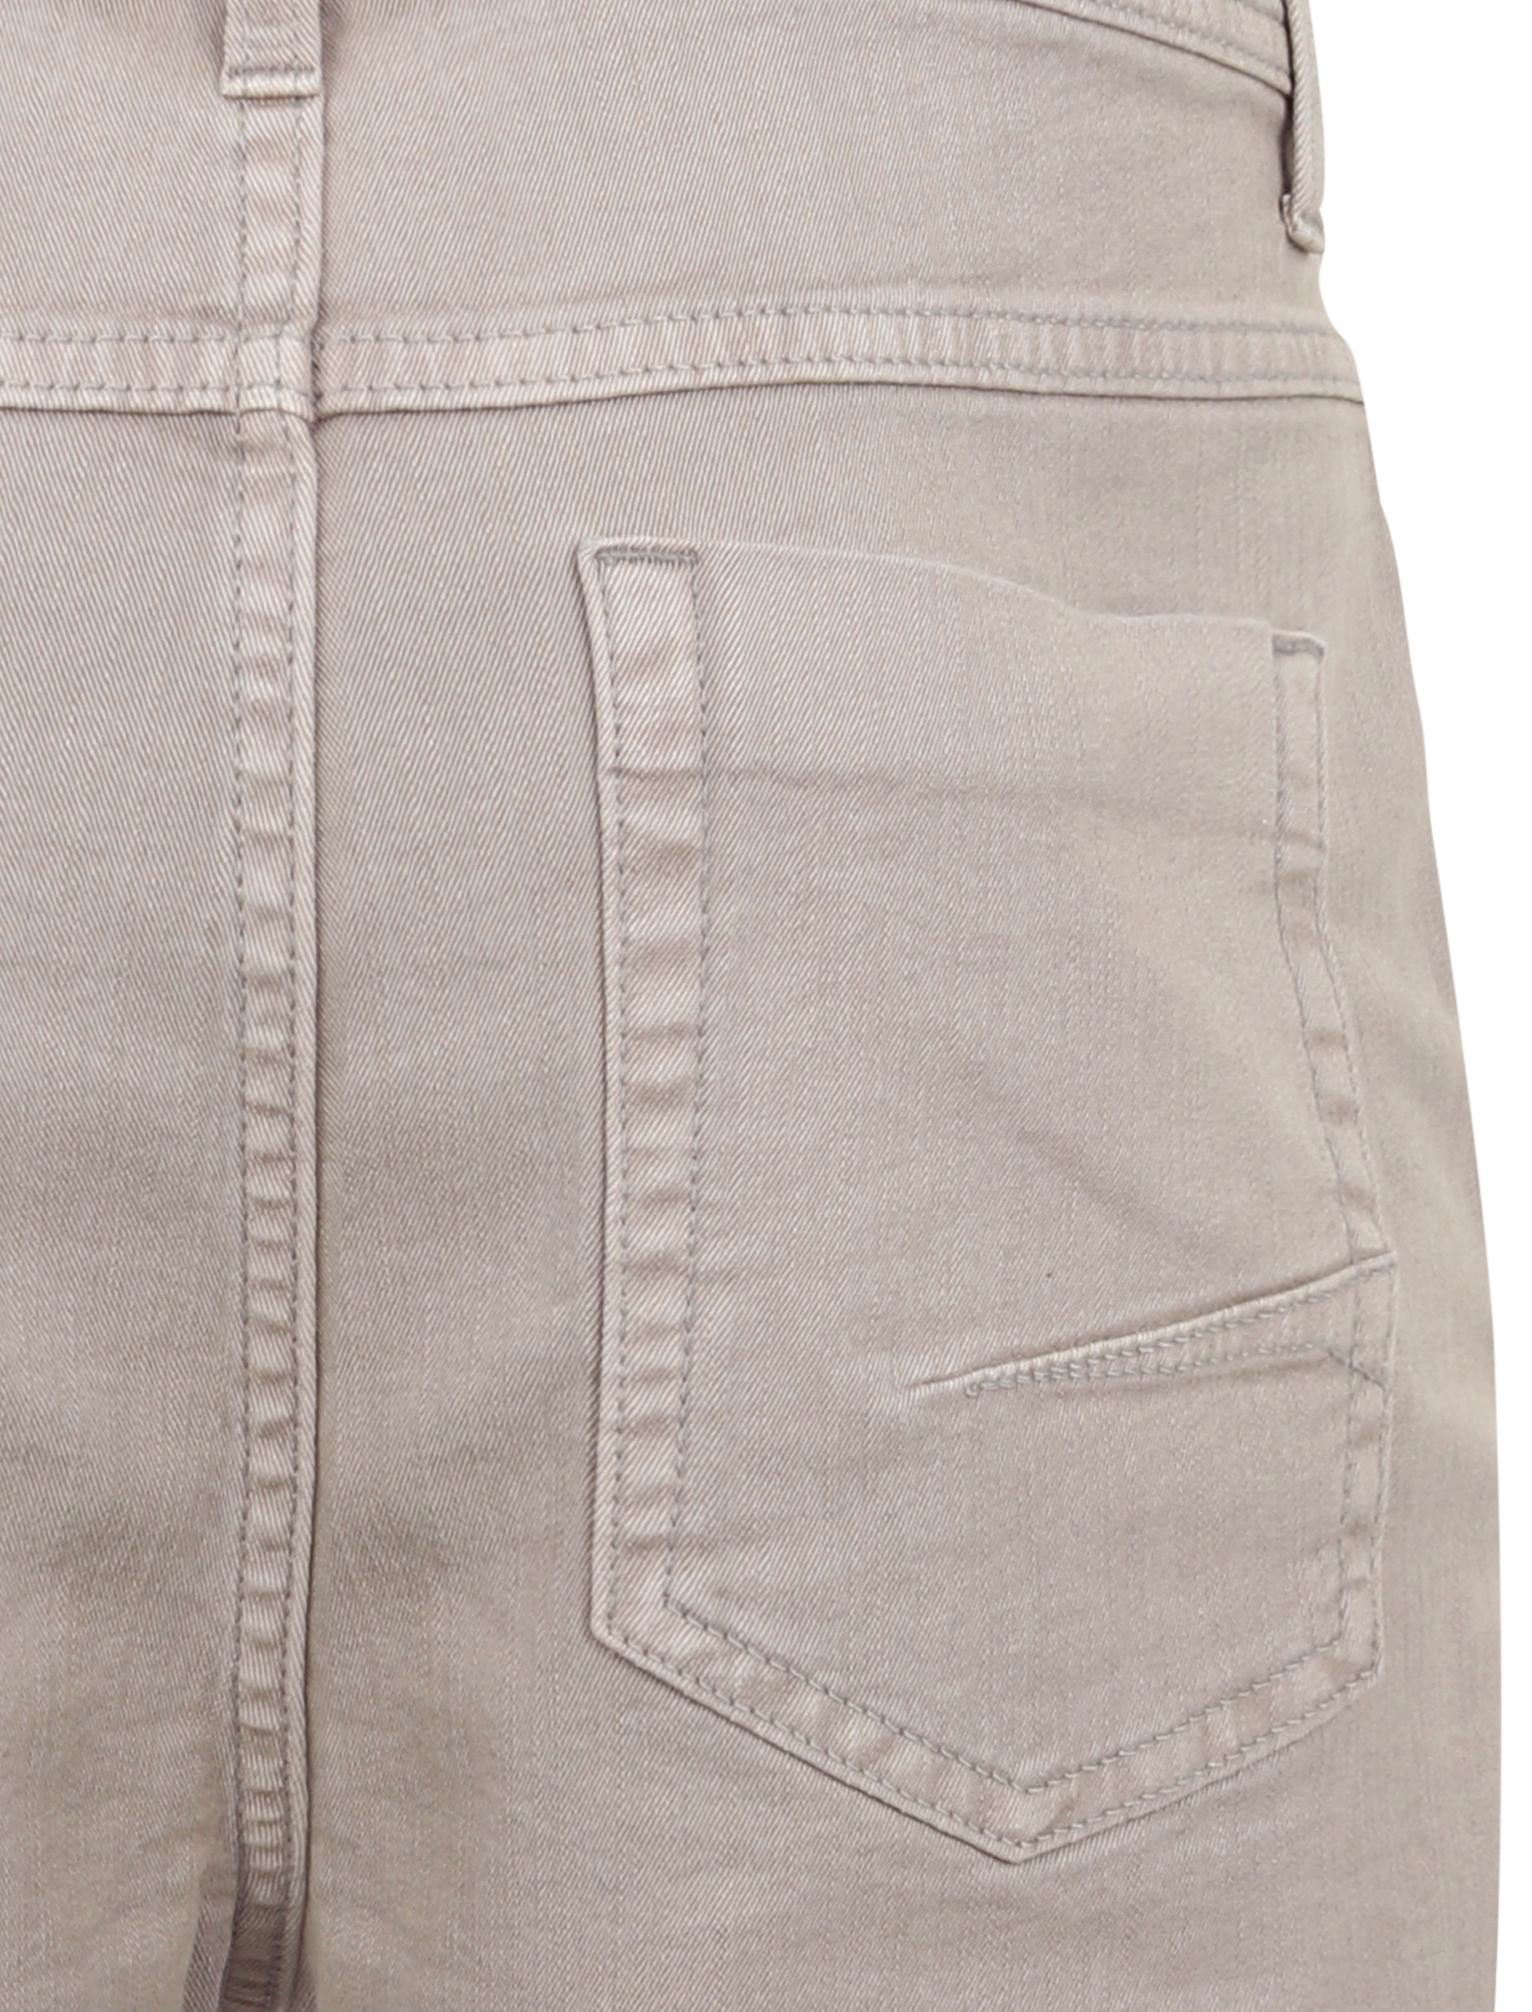 Tokyo Laundry Men/'s Lovelock Stretch Denim Shorts Chino Jean Regular Fit Summer